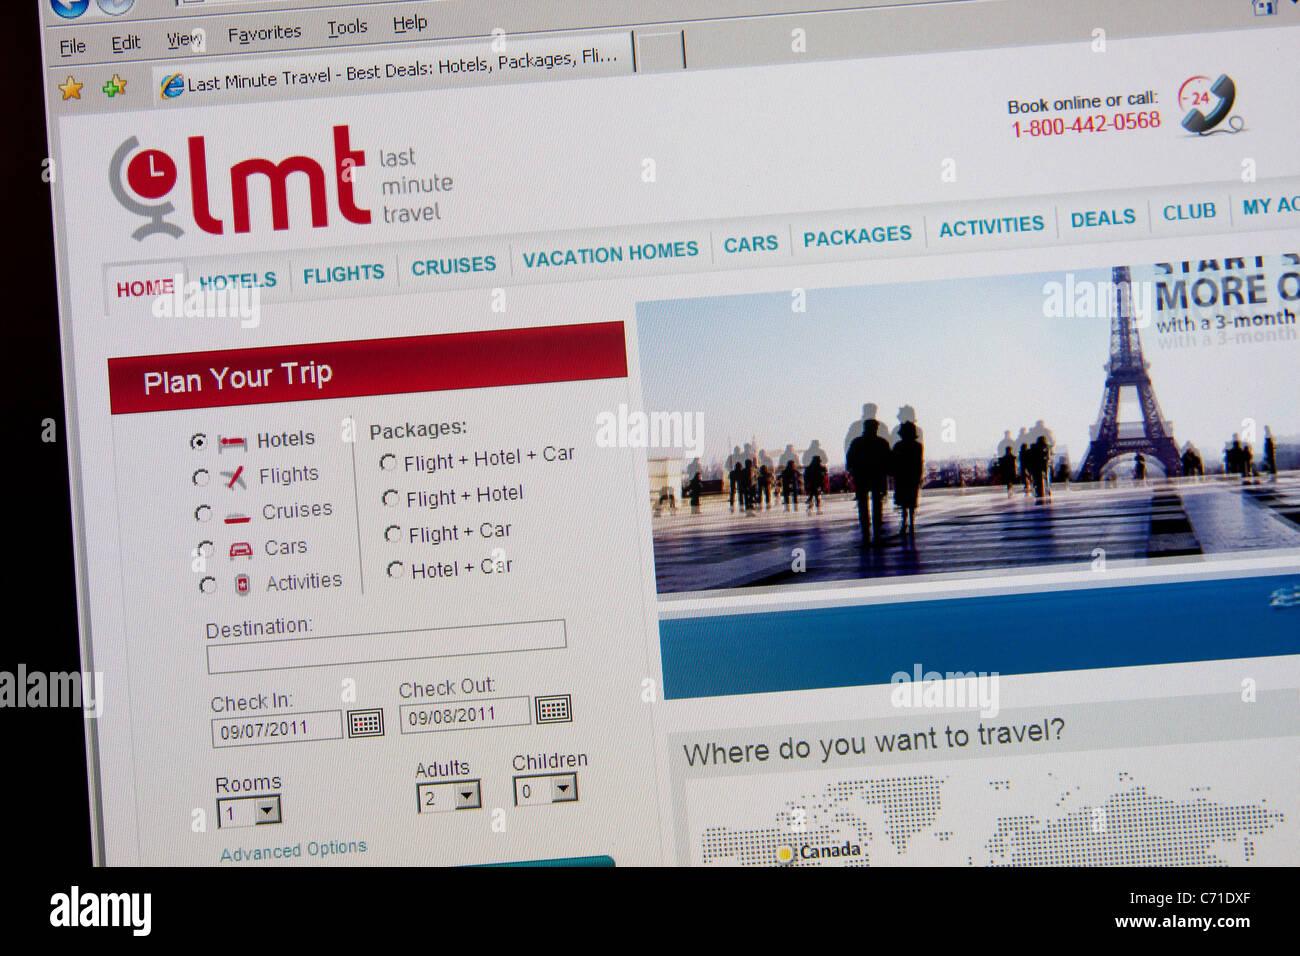 last minute online travel booking website - Stock Image